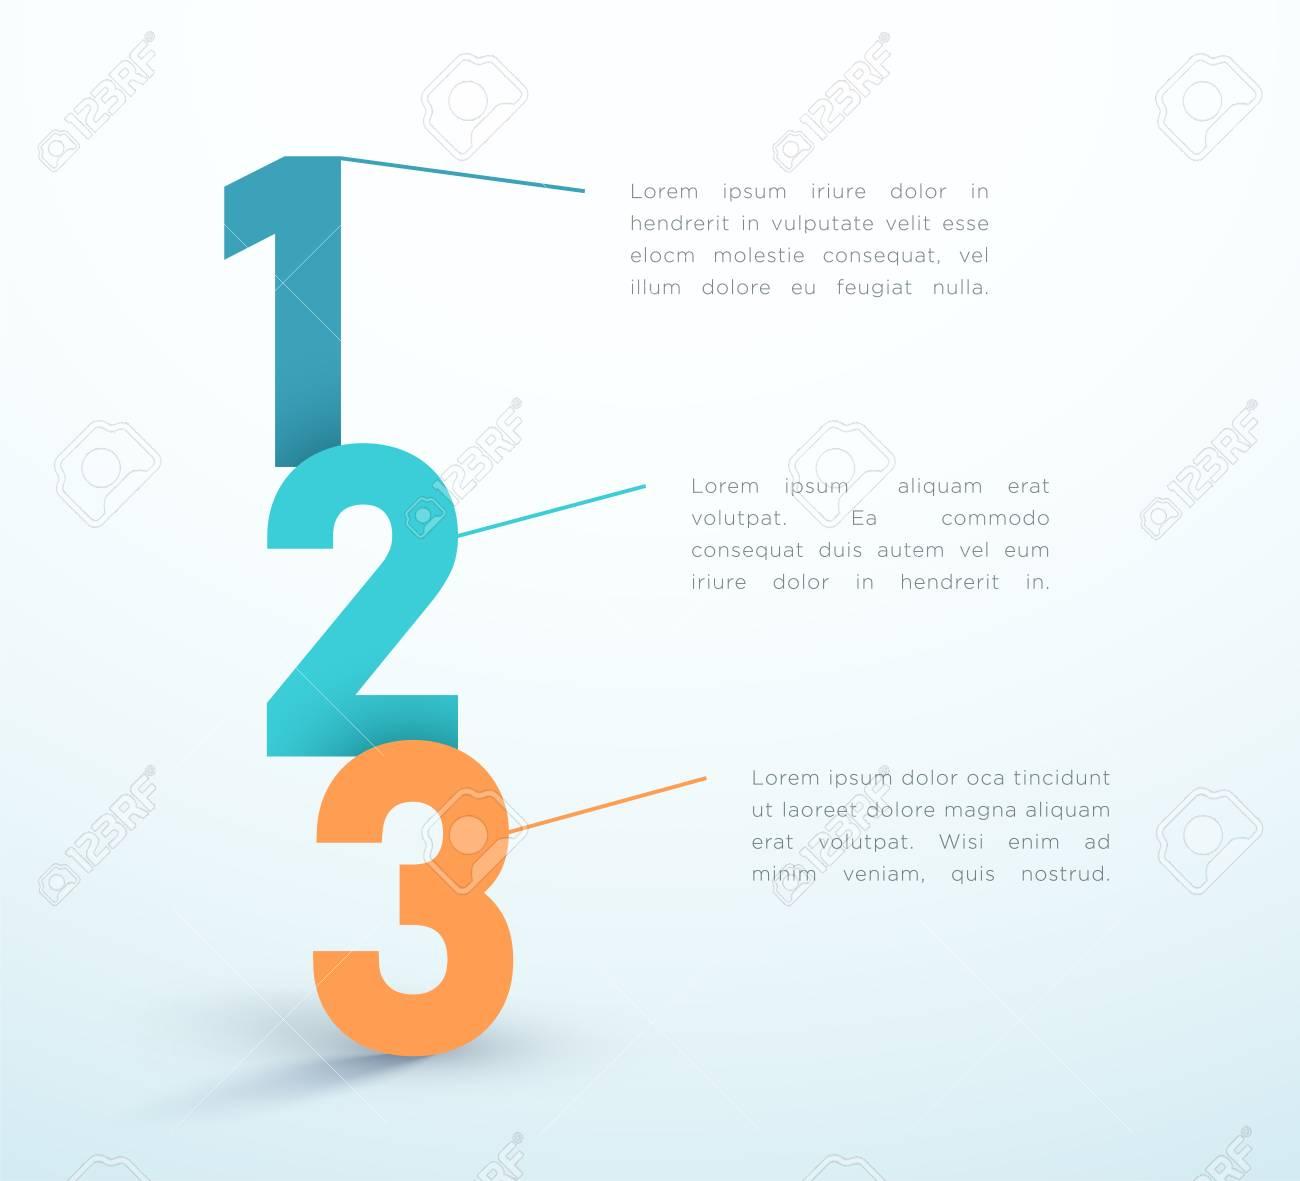 Number Steps 1, 2, 3 Infographic Vector Design - 116874206